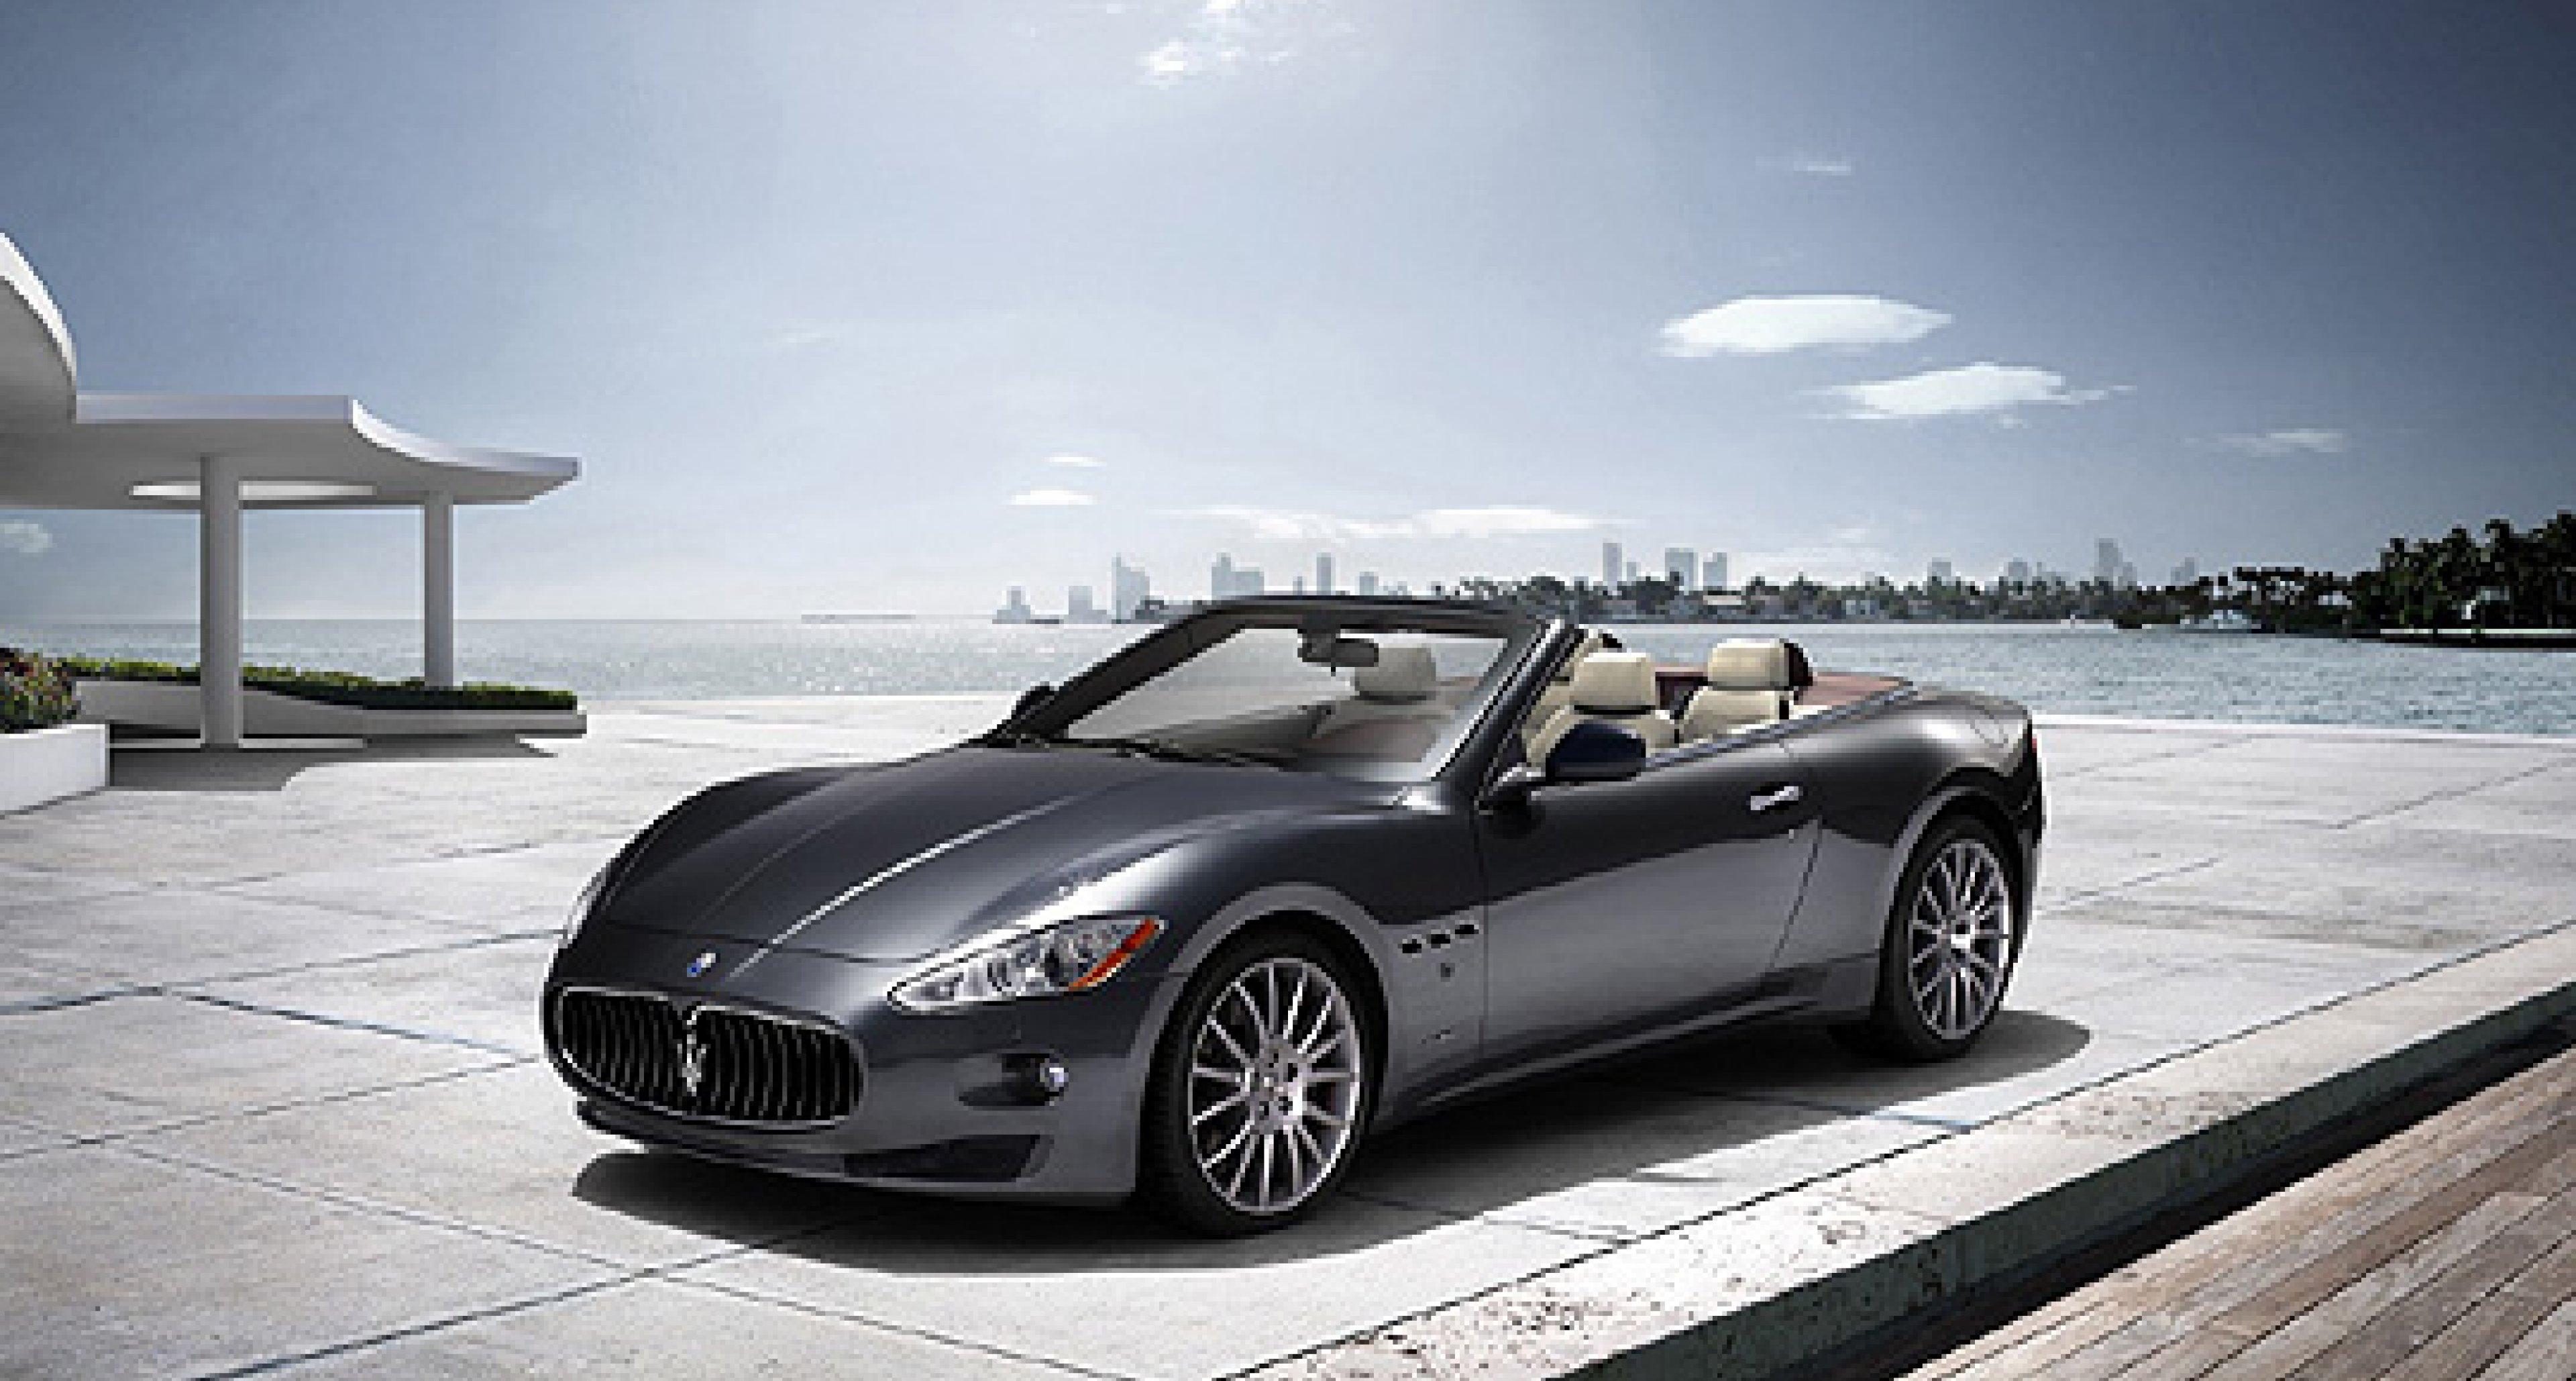 Maserati GranCabrio: Third Prong of the Trident